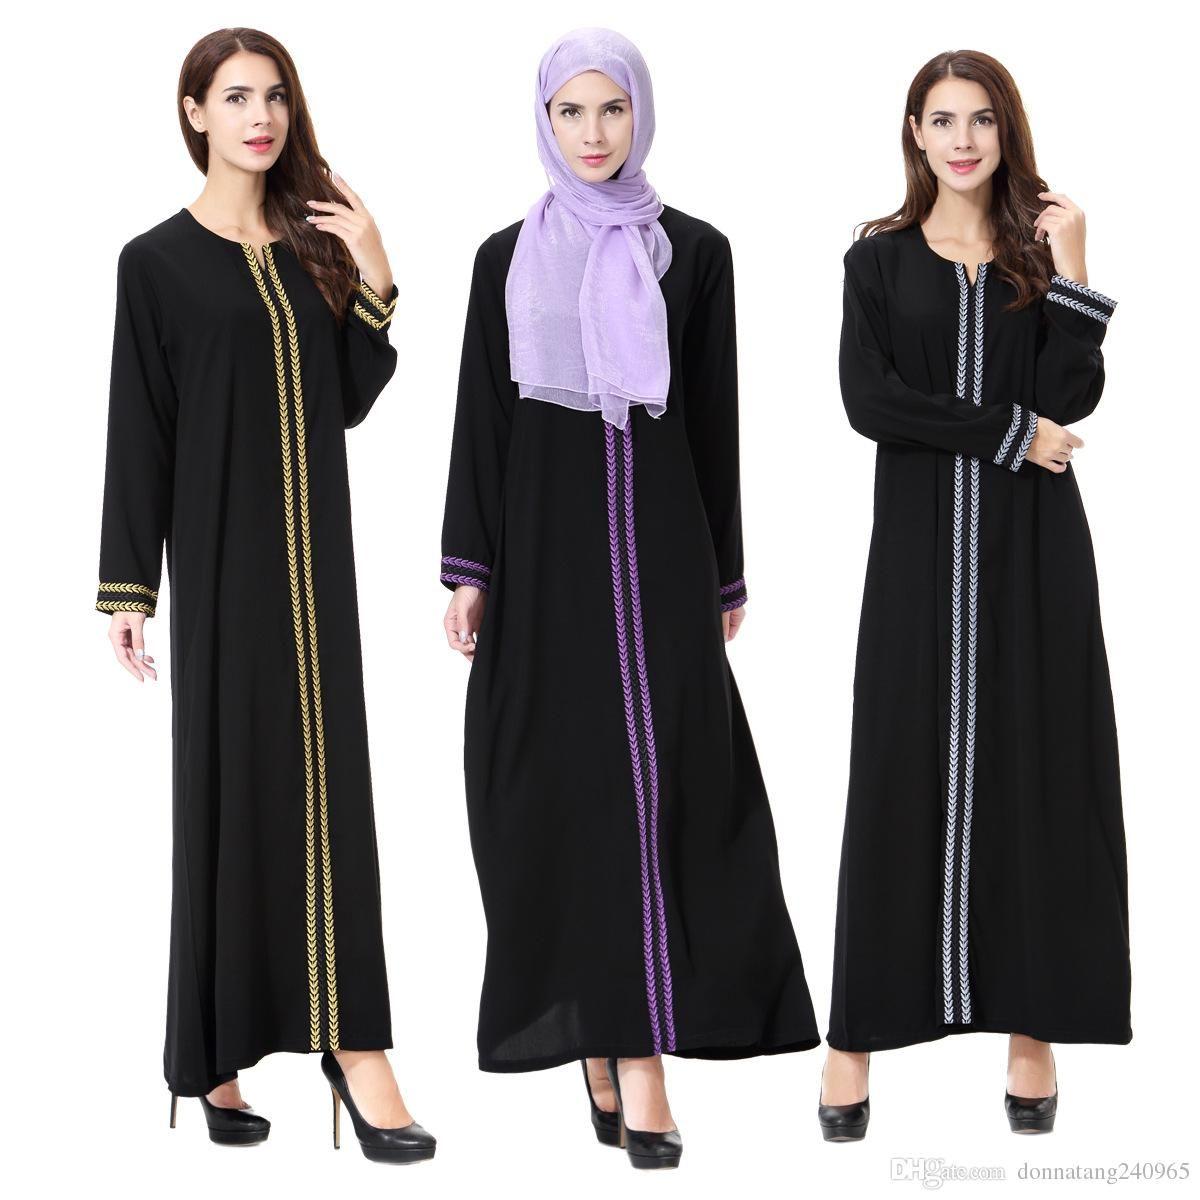 777cac29fd Fashion Muslim Adult Female Lace Abaya Prayer Dress Long Sleeve Dubai  Clothes Style Arabian Robes Ethnic Costume Long Short Dress Cocktail  Dresses Long From ...